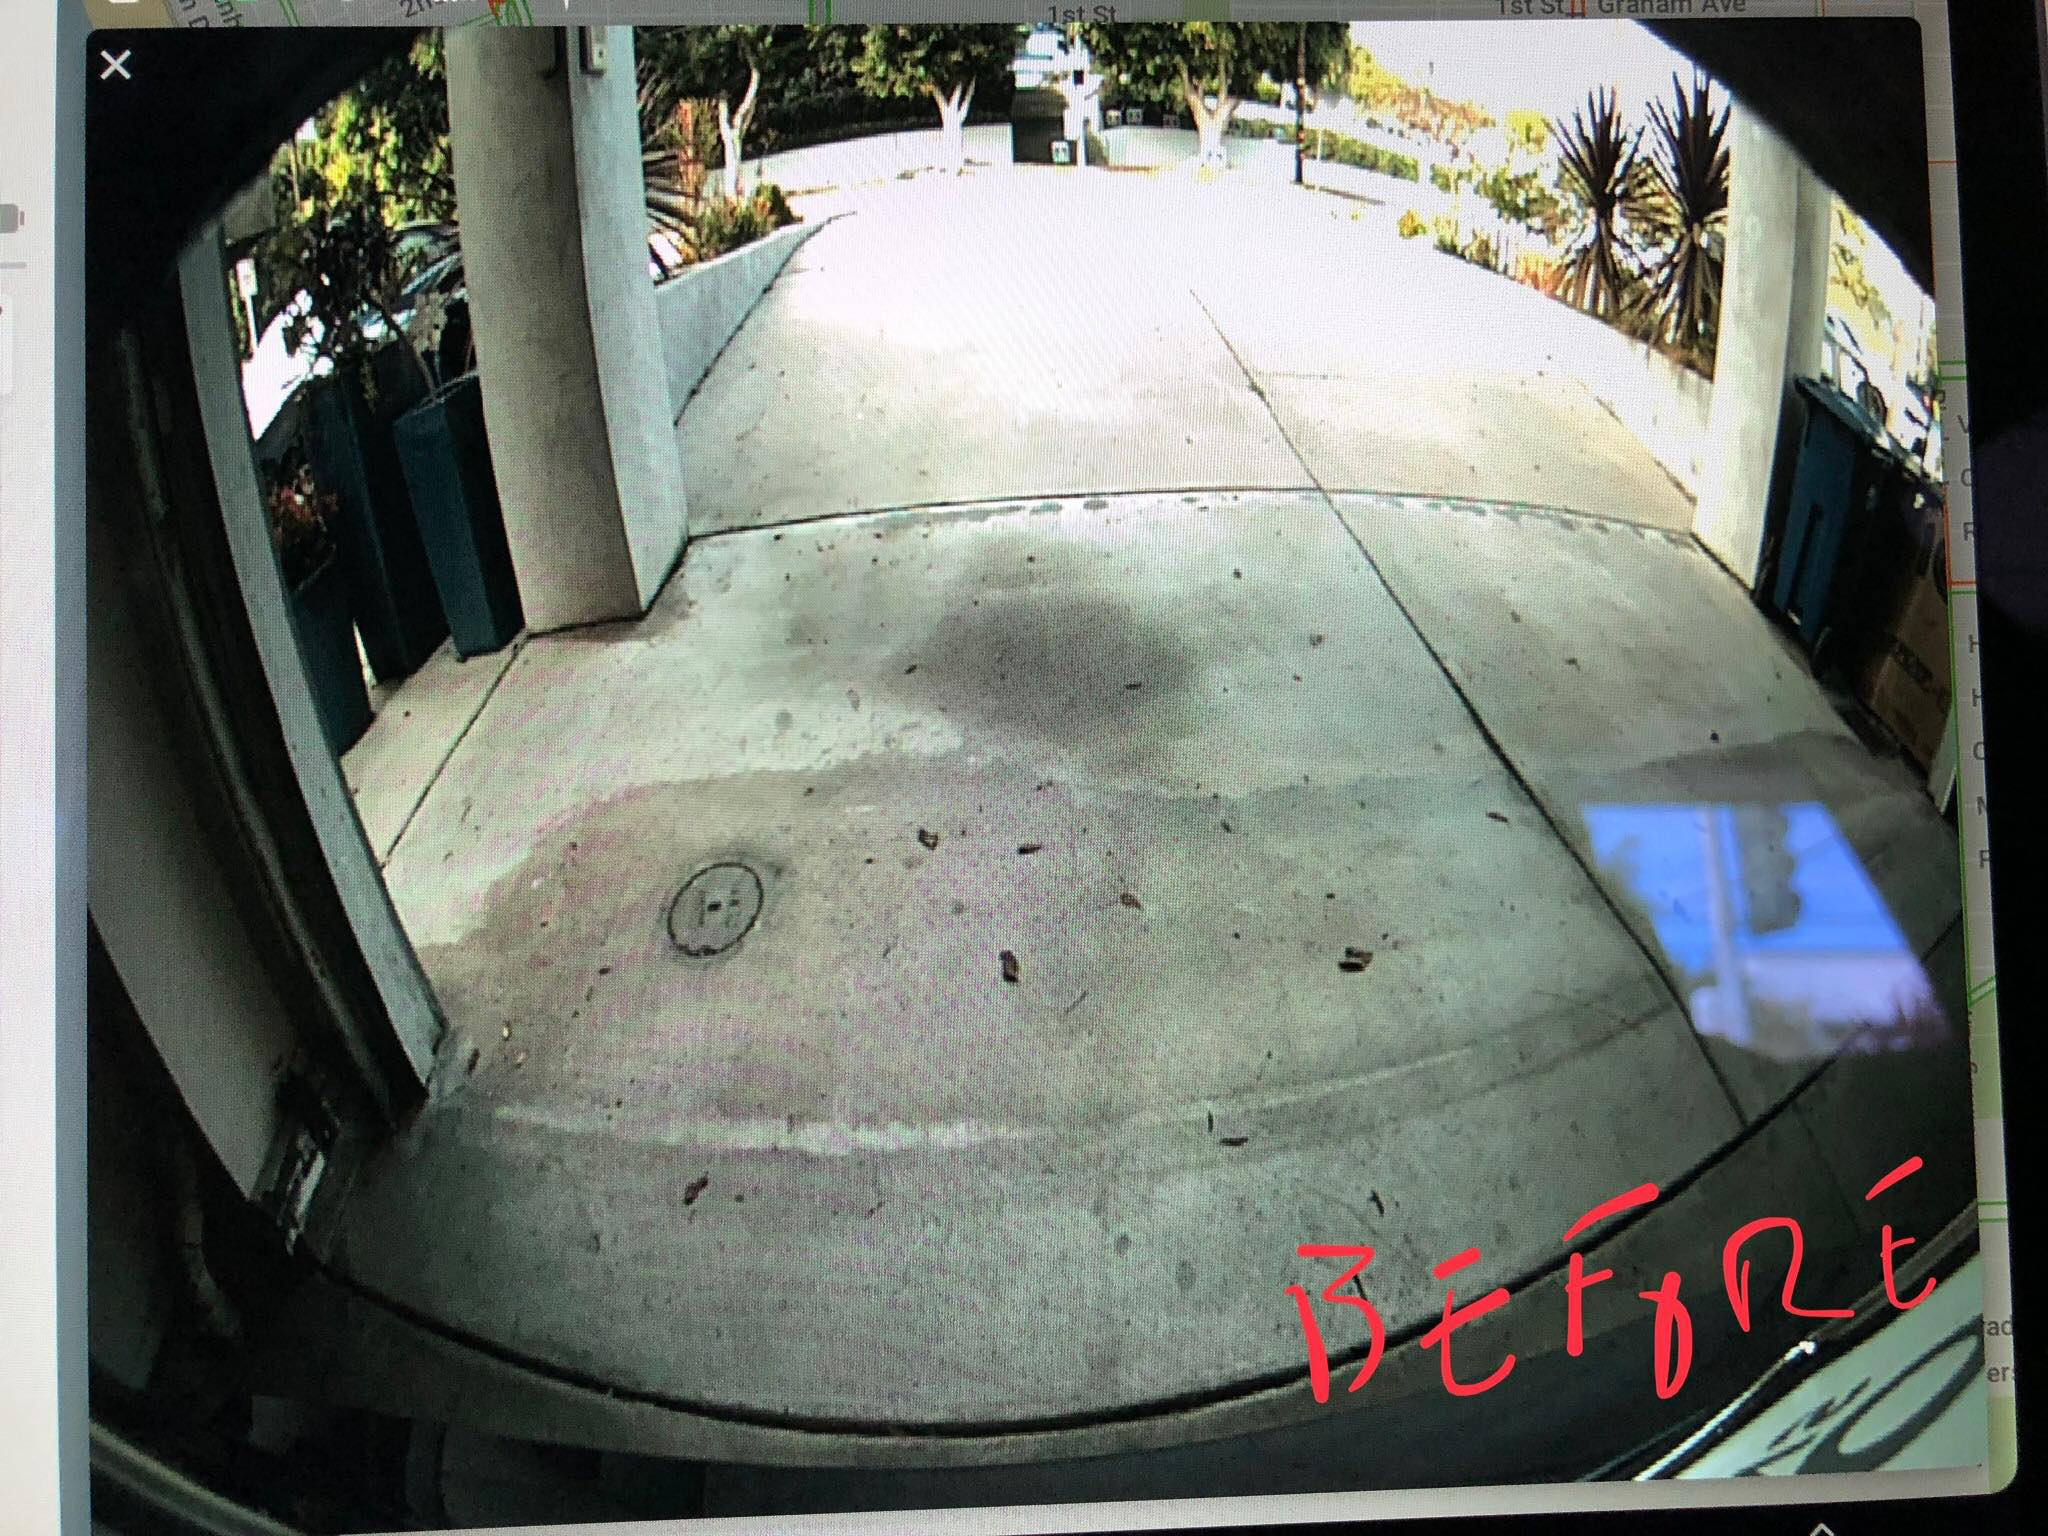 Tesla improves Model 3 backup camera image quality through software